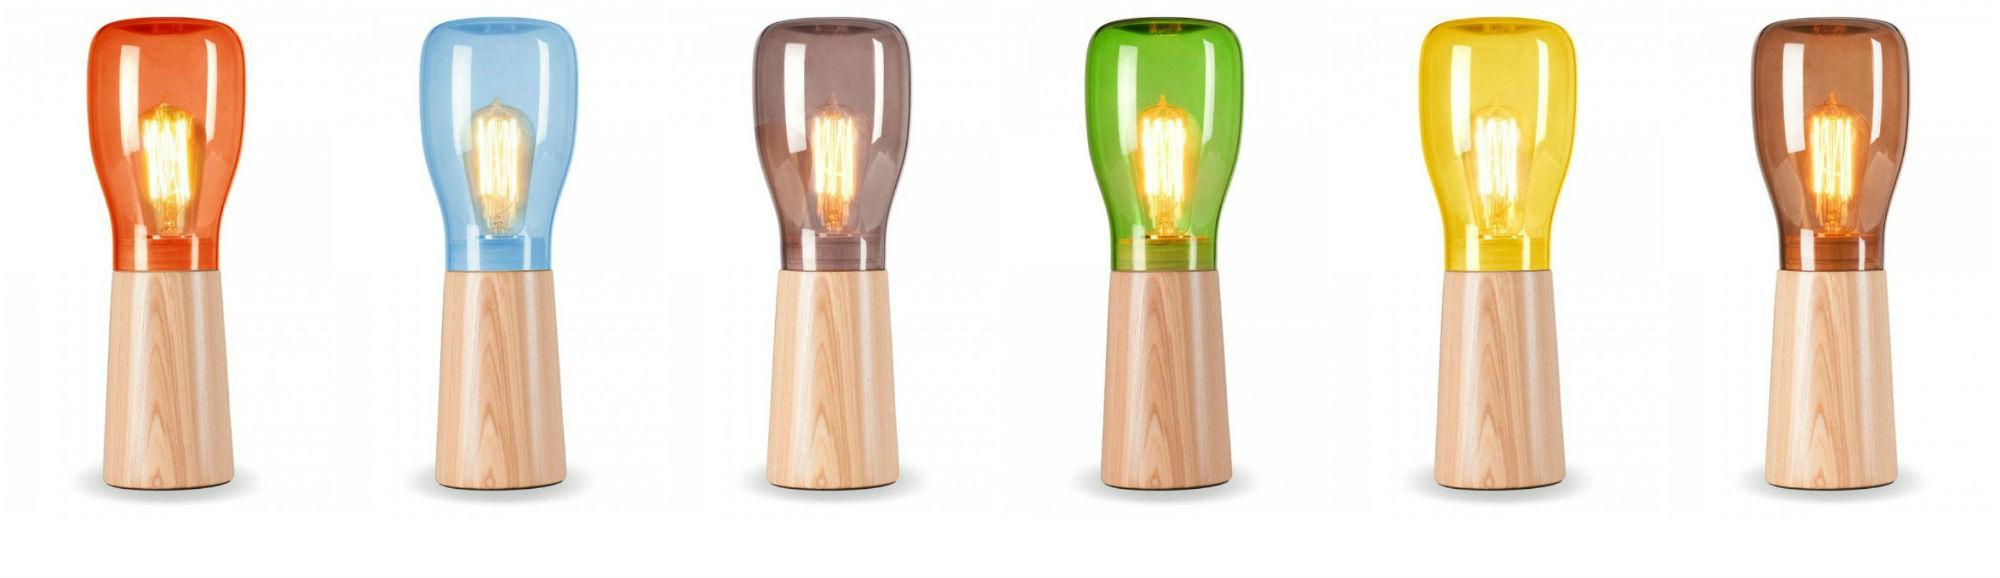 Lampes-design-champignon-Cult-Living-Vase